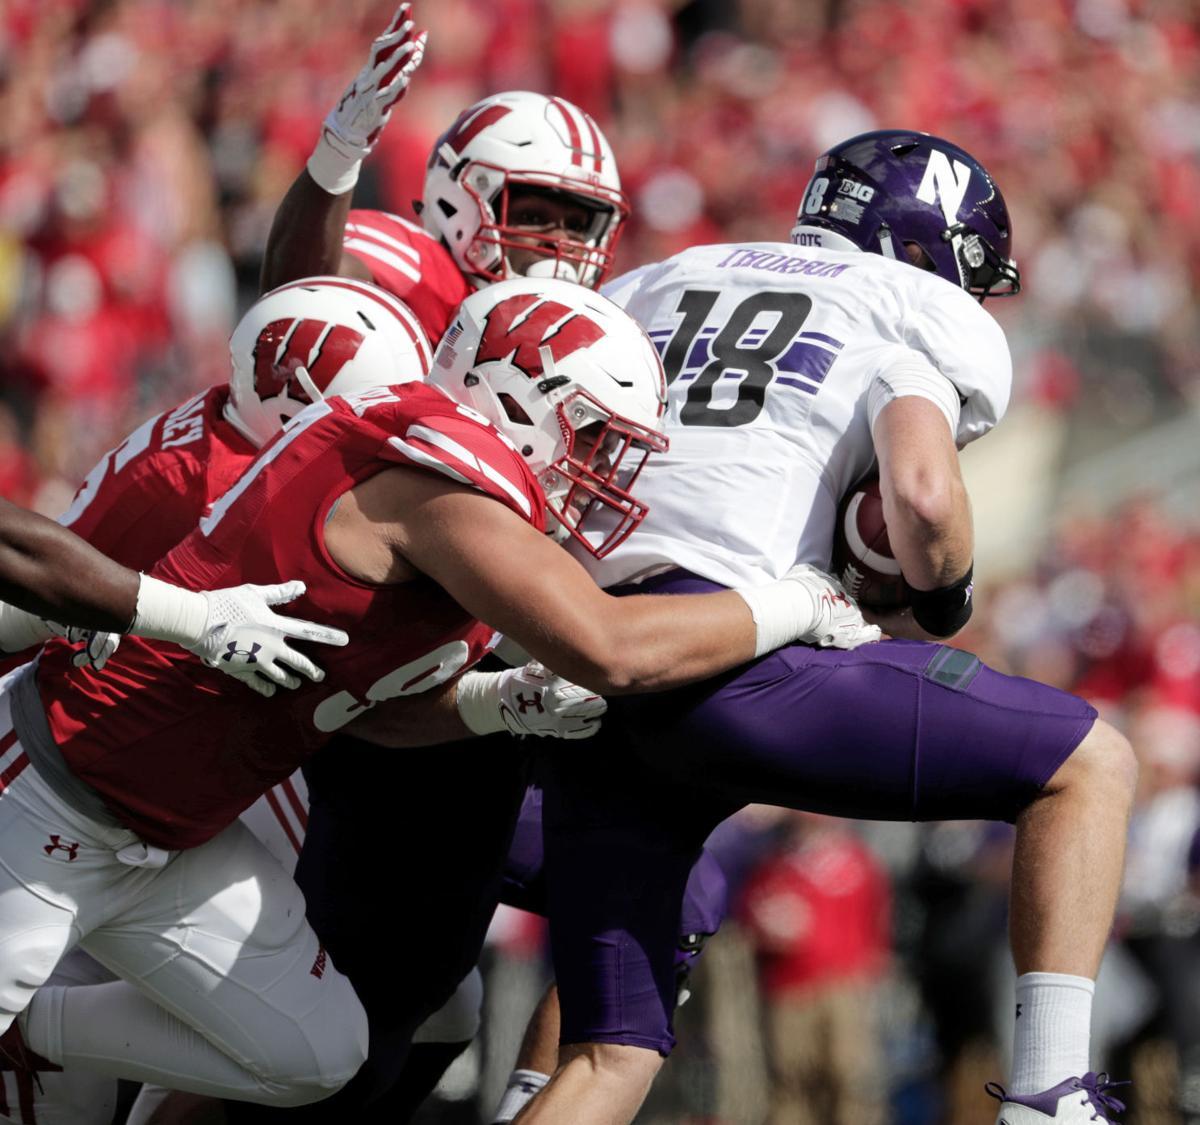 Wisconsin-Northwester sack